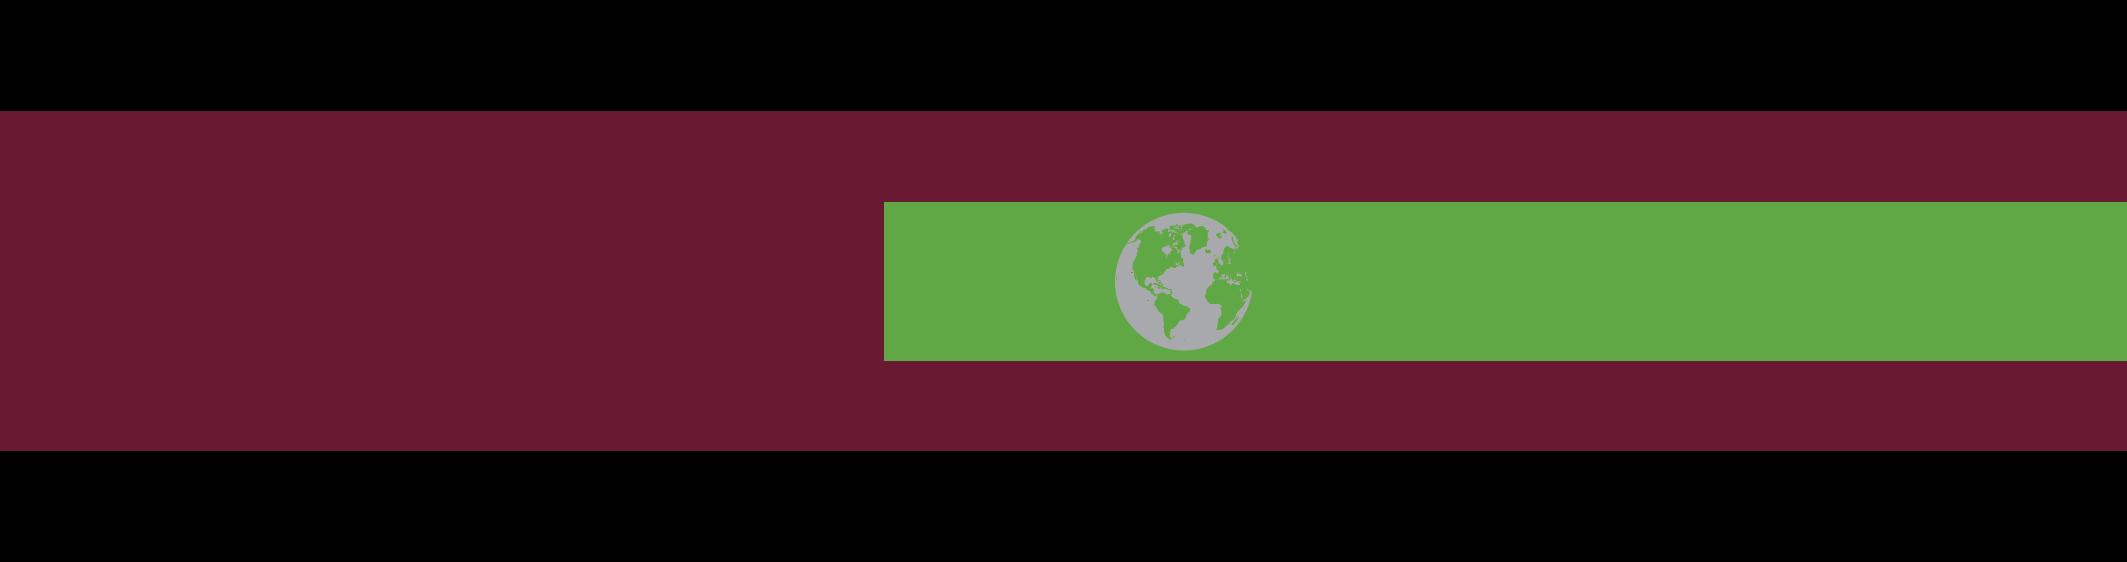 F&B_CONNECT_LOGO